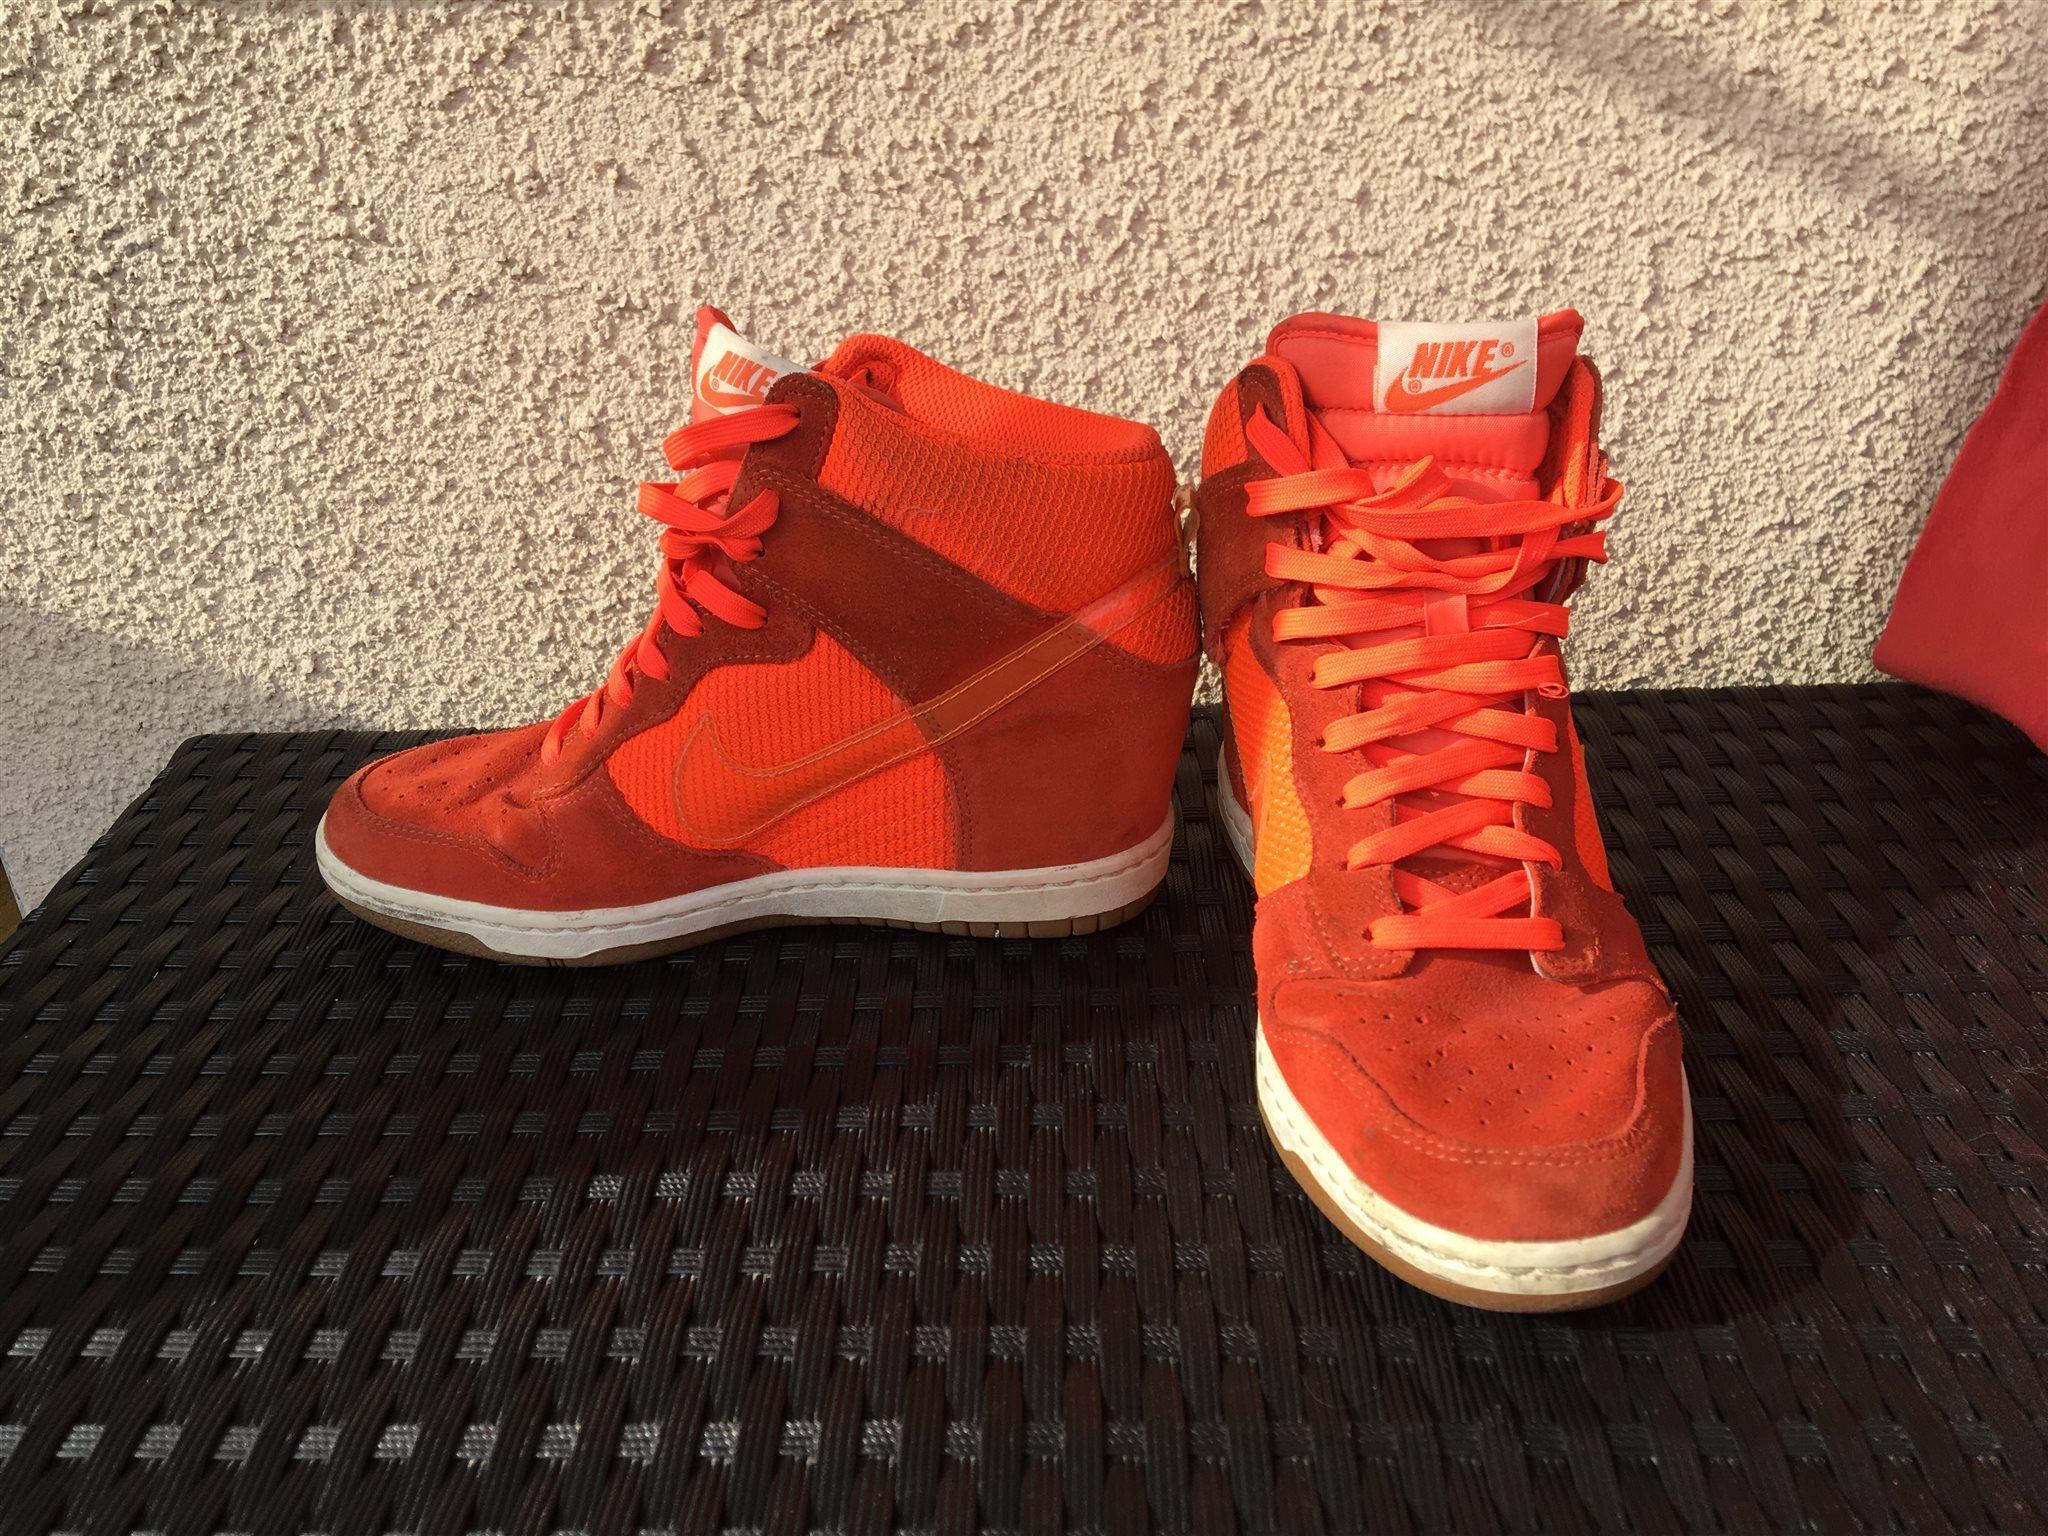 a3b8c7785277 Nike dunk sky high sneakers m kilklack (319923850) ᐈ Köp på Tradera